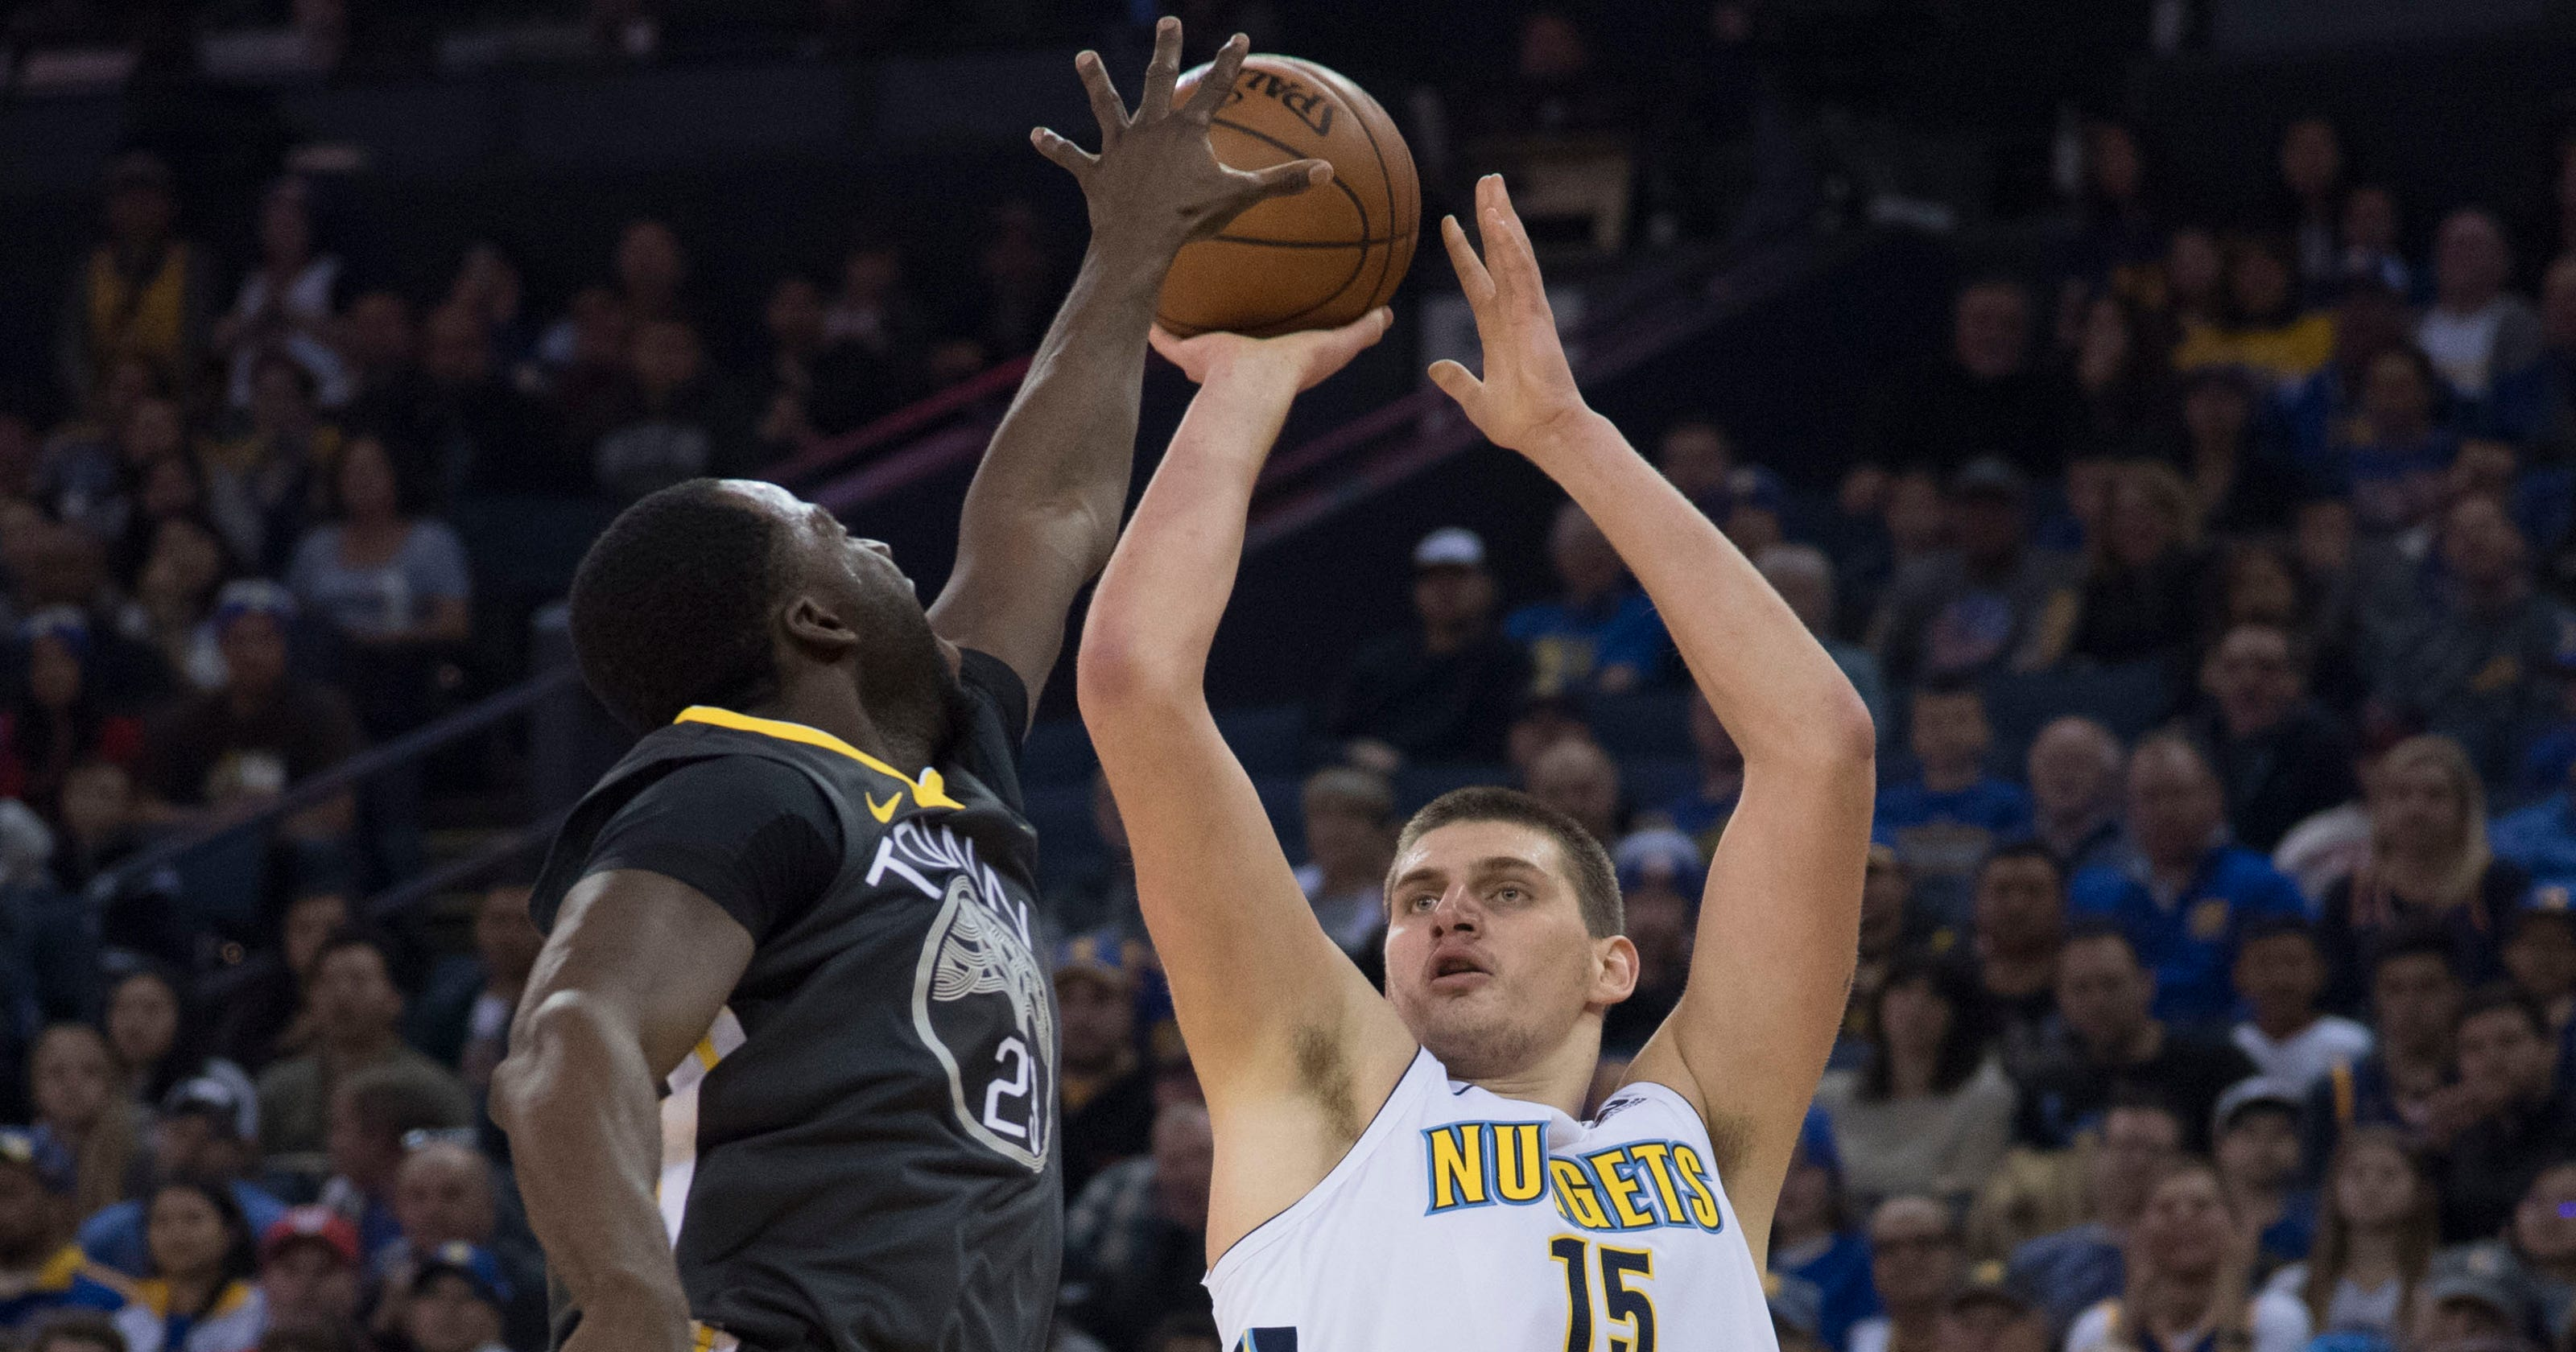 33aaf43d5dc Denver Nuggets stop Golden State Warriors  win streak at 11 games